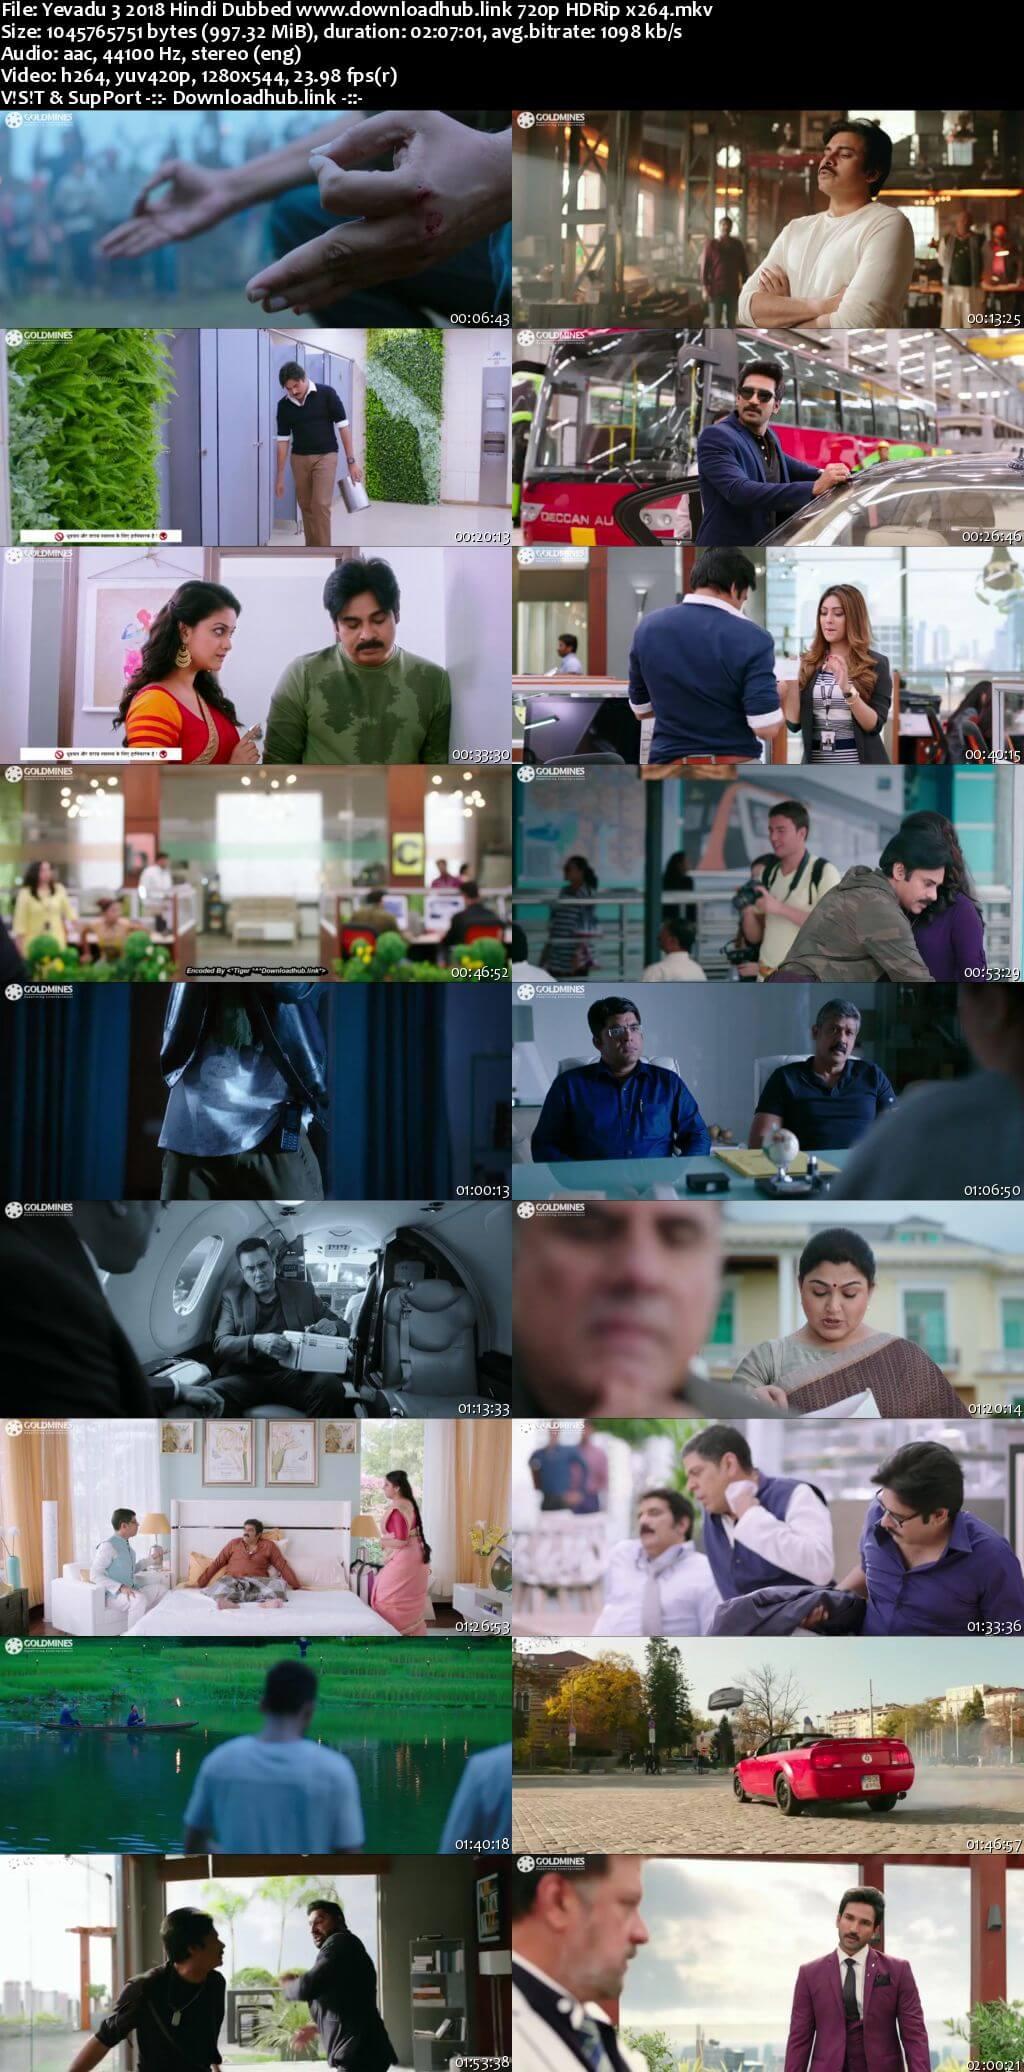 Yevadu 3 2018 Hindi Dubbed 720p HDRip x264